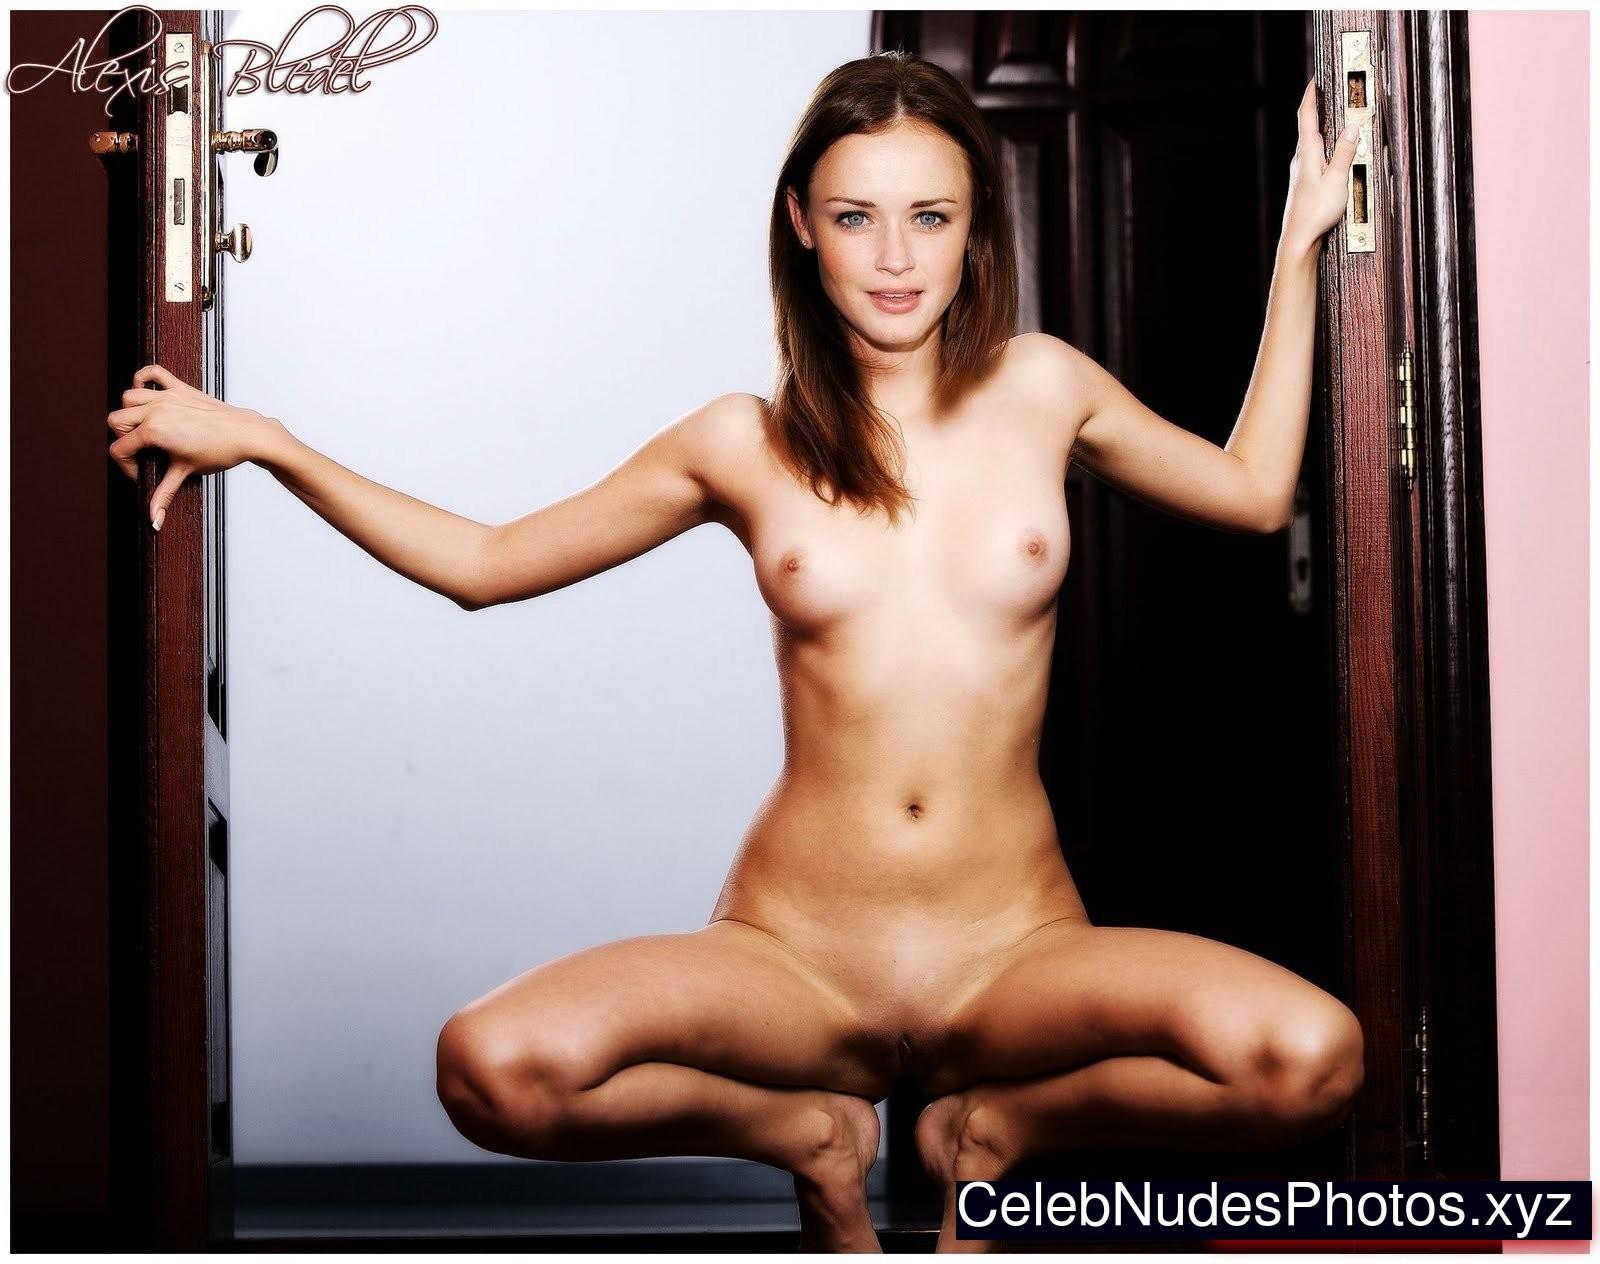 Nude bledel famous alexis celebrities